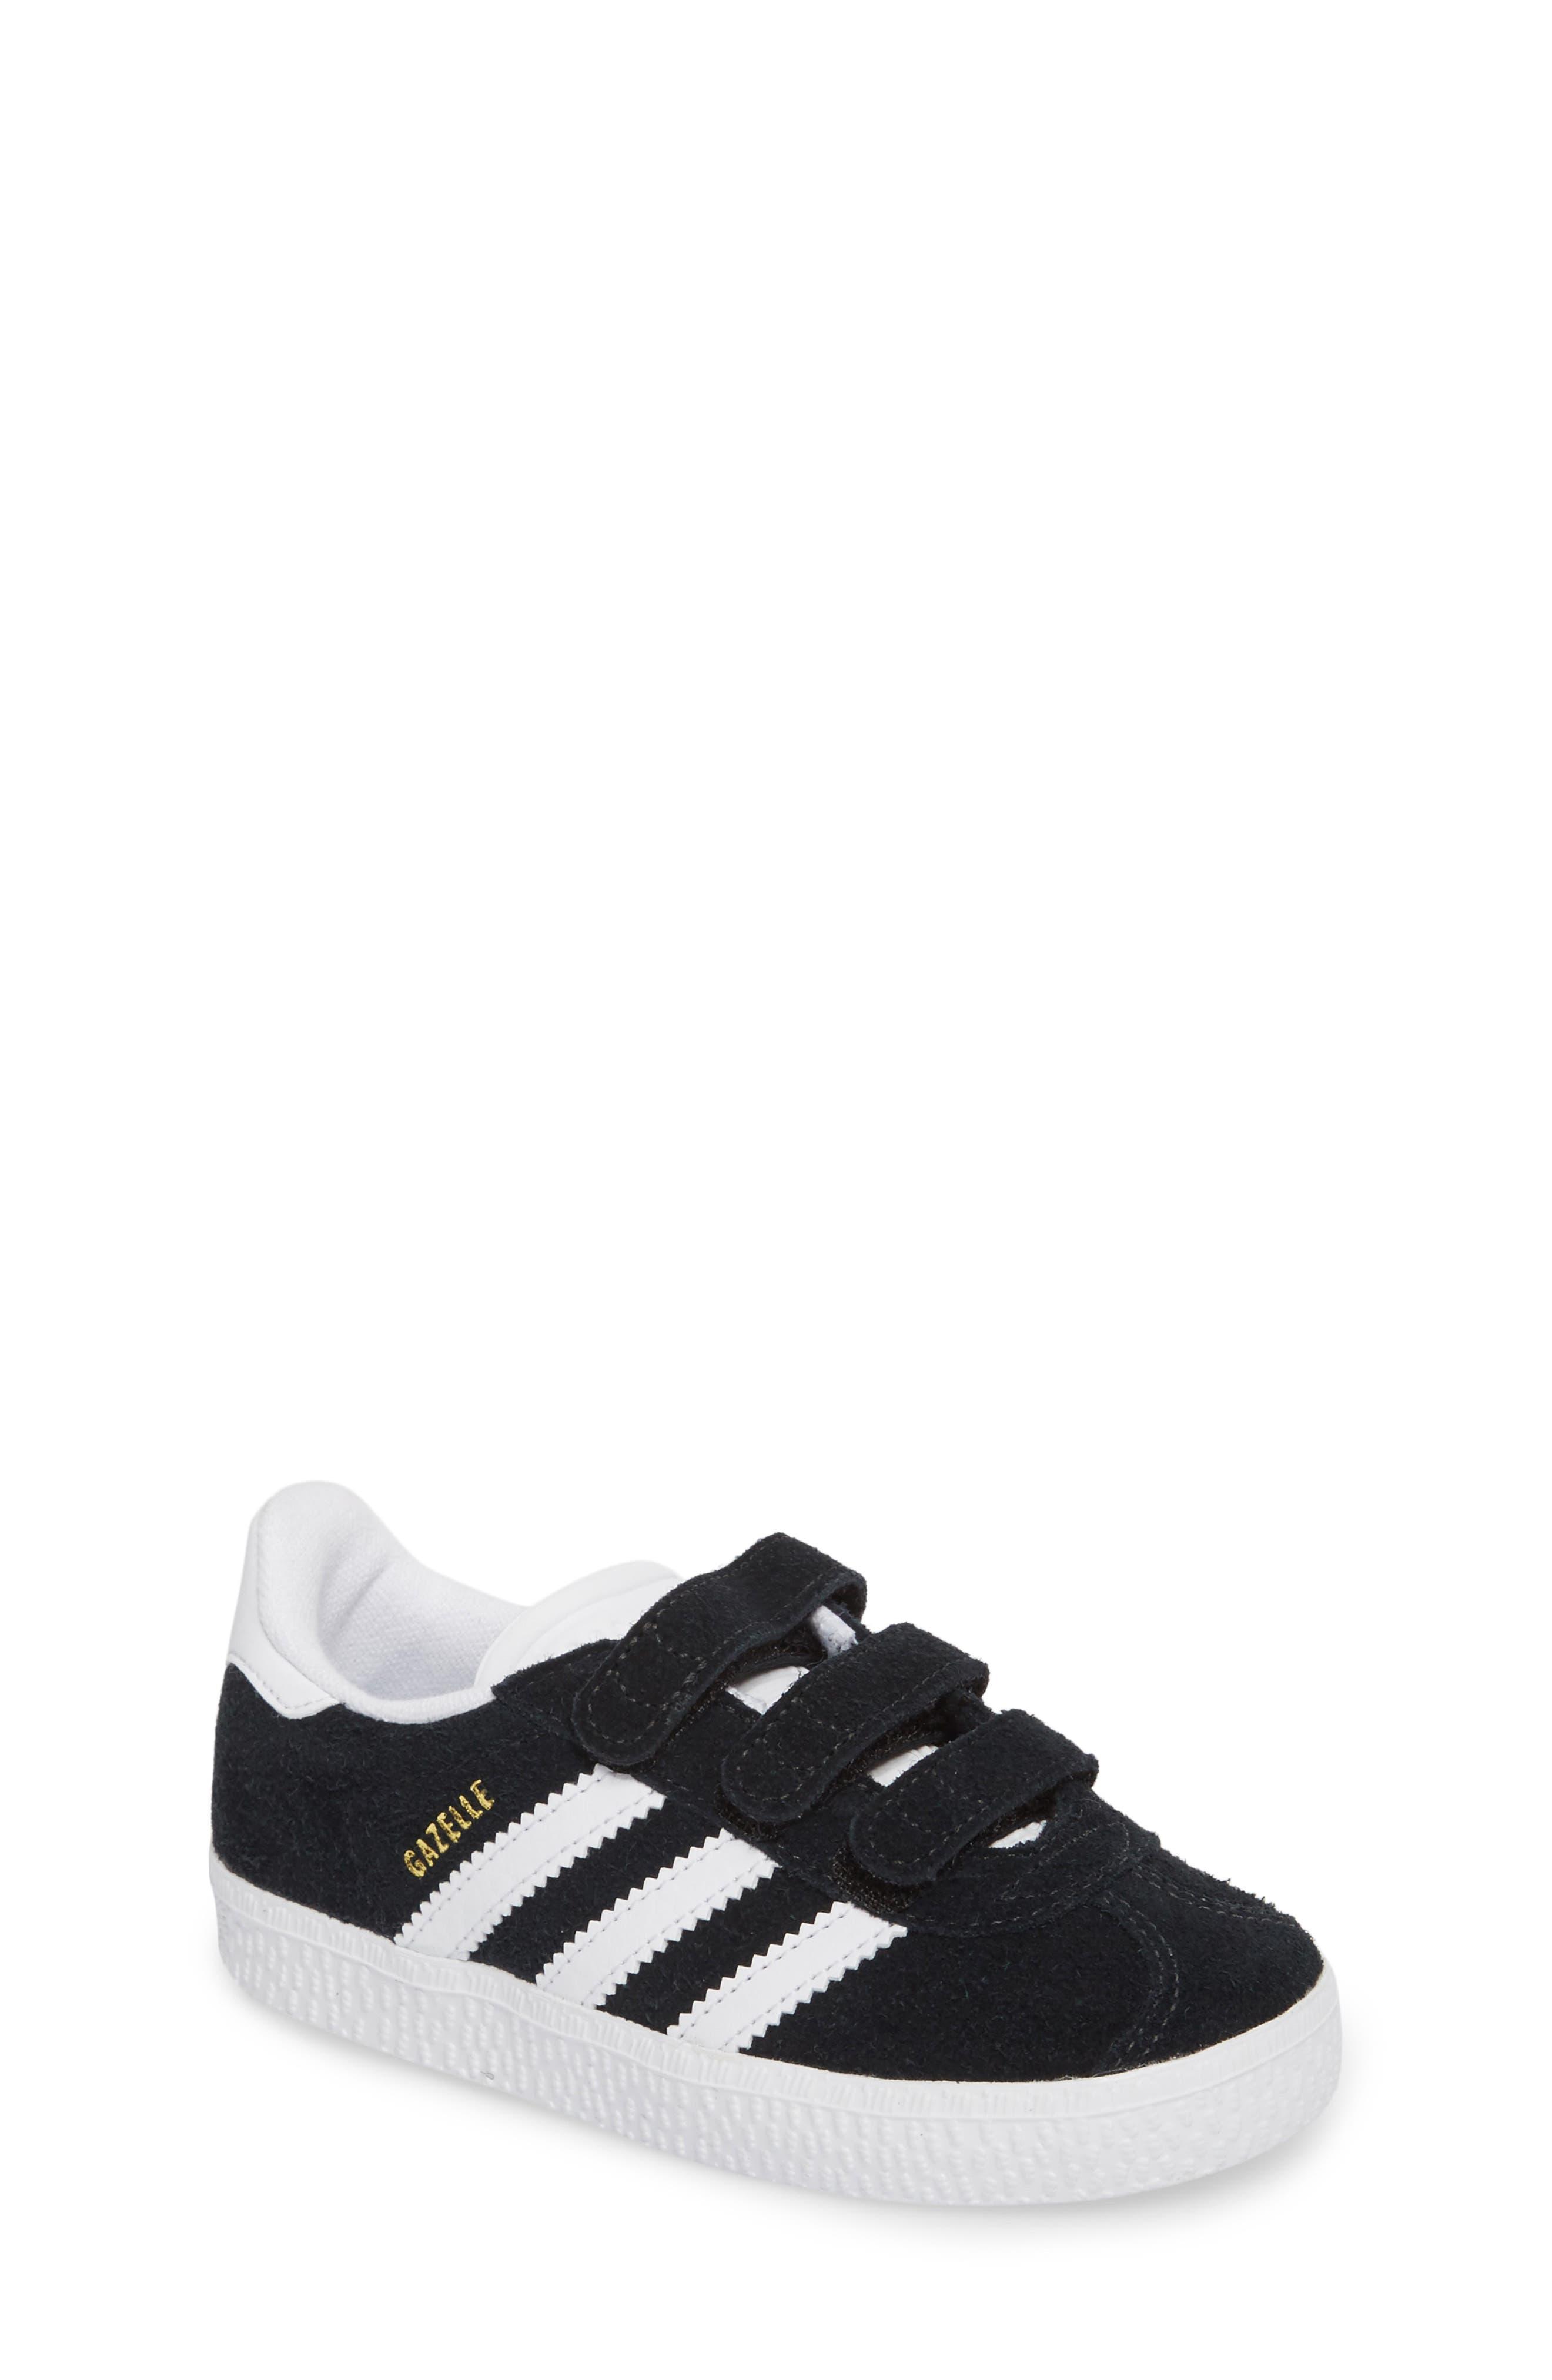 Gazelle Sneaker,                         Main,                         color, Core Black / White / White